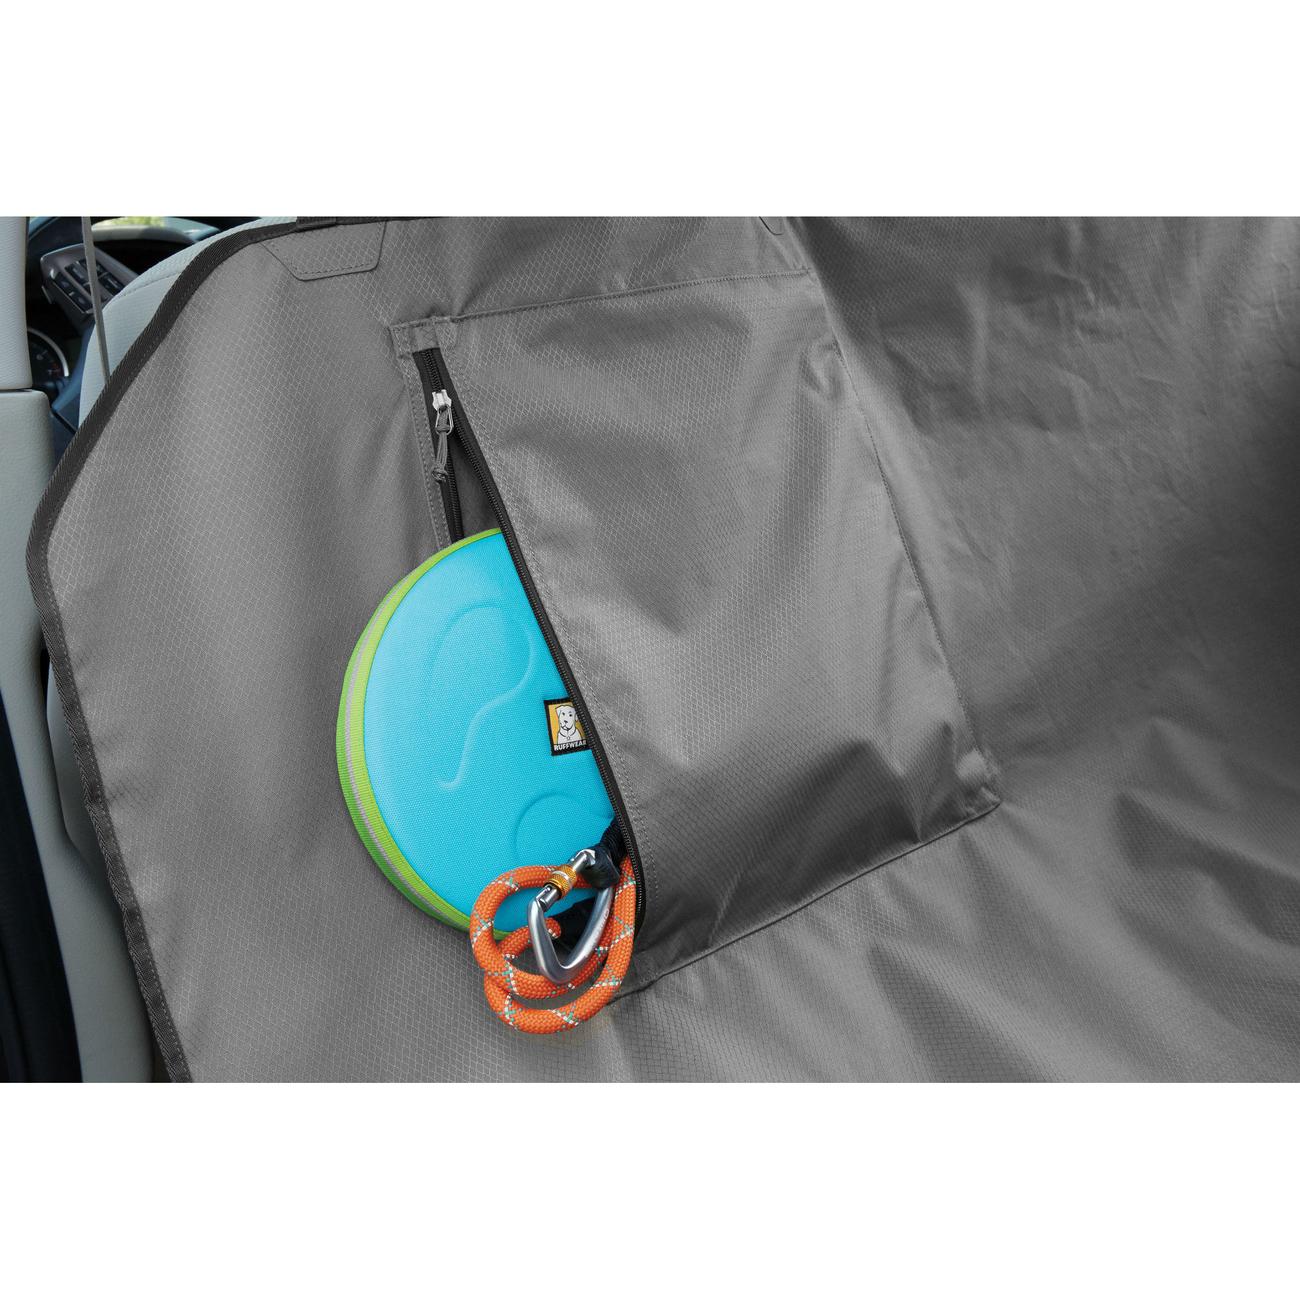 Ruffwear Dirtbag Seat Cover Autoschutzdecke, Bild 5